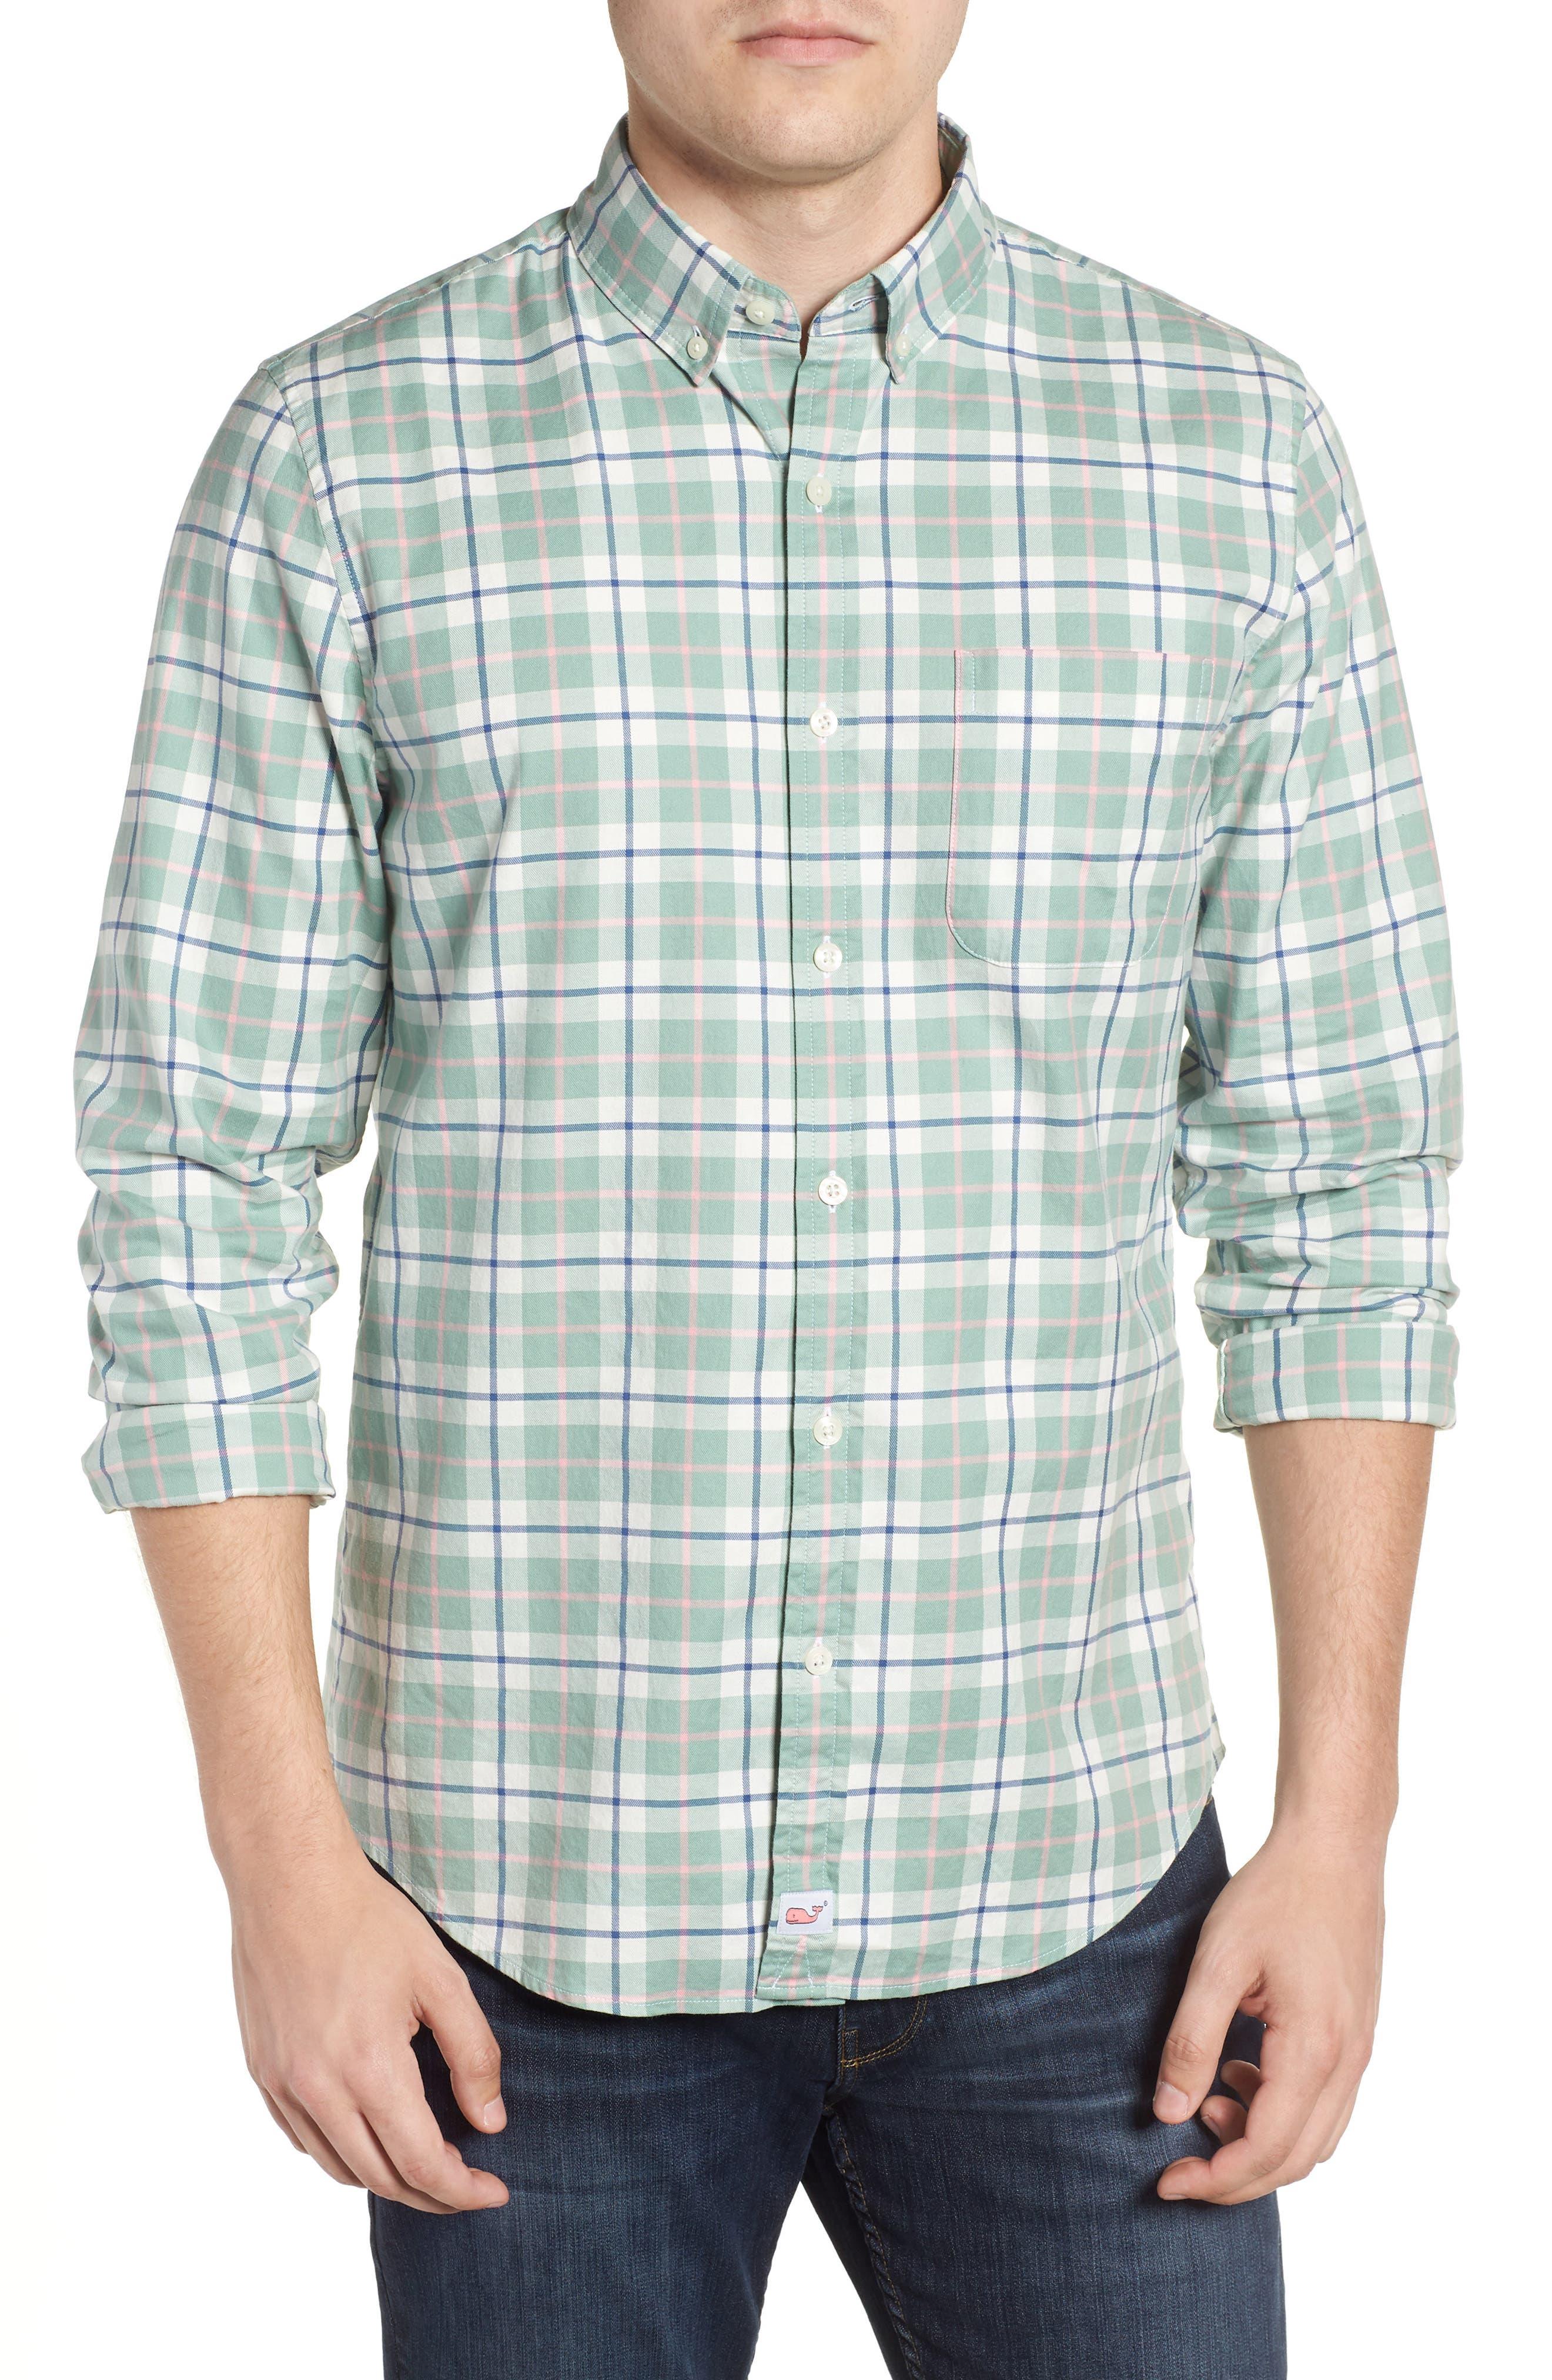 Riverbank Regular Fit Plaid Sport Shirt,                             Main thumbnail 1, color,                             DESERT GREEN